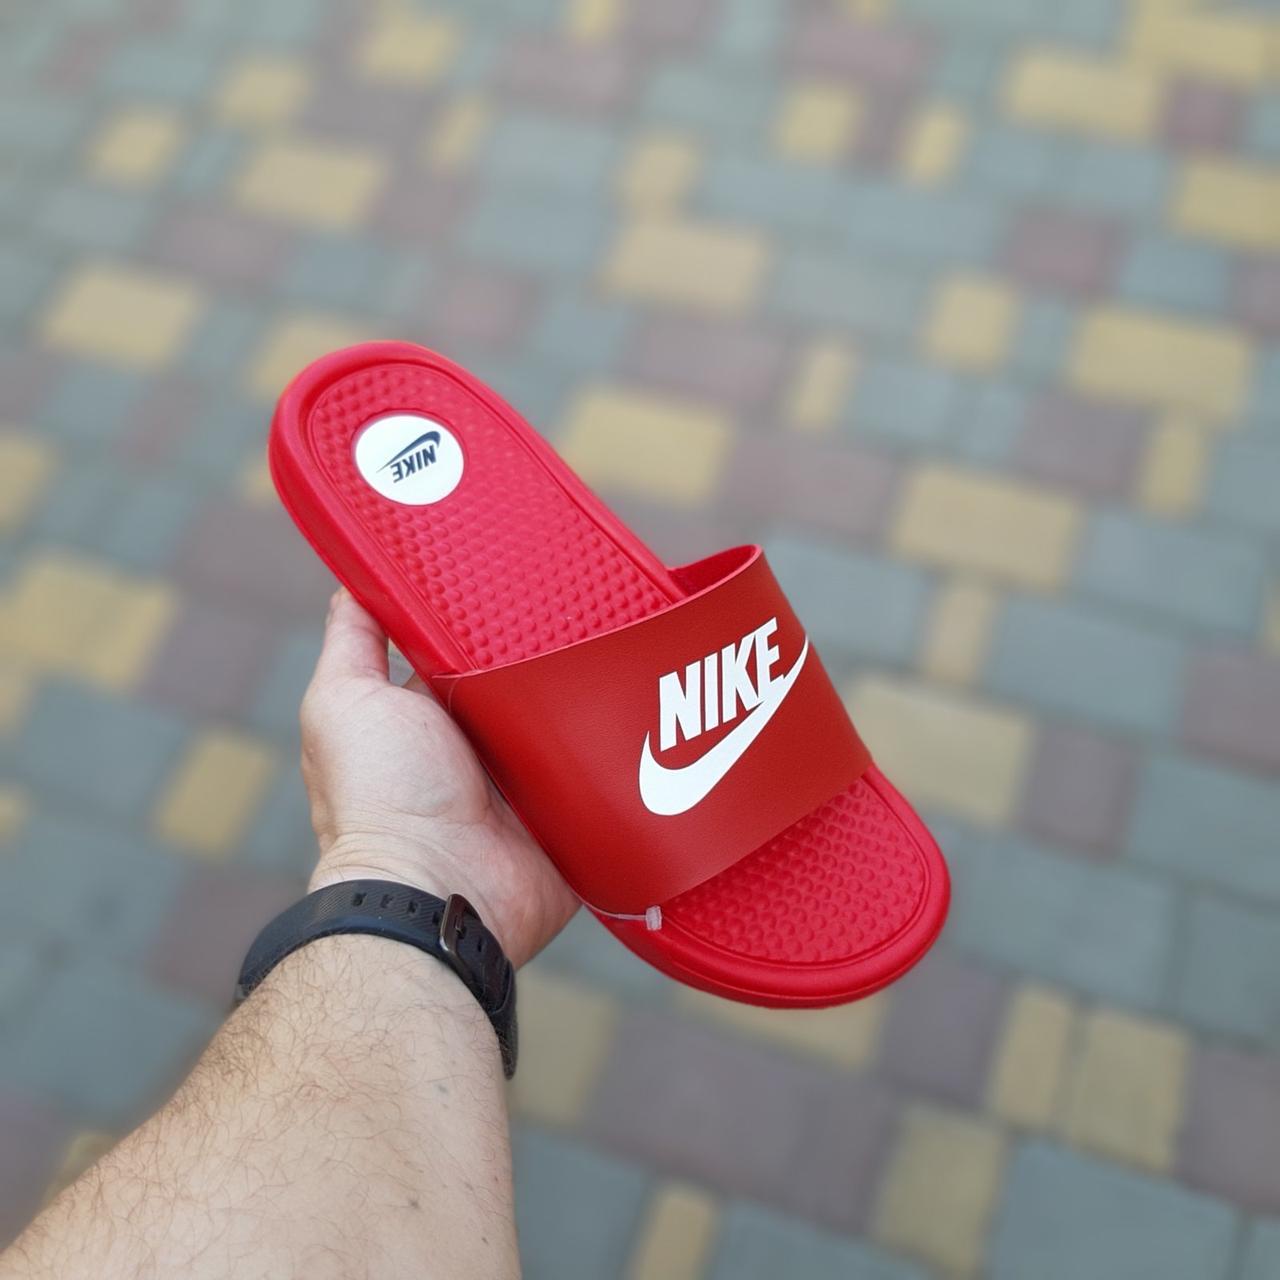 Мужские сланцы Nike Red, Реплика